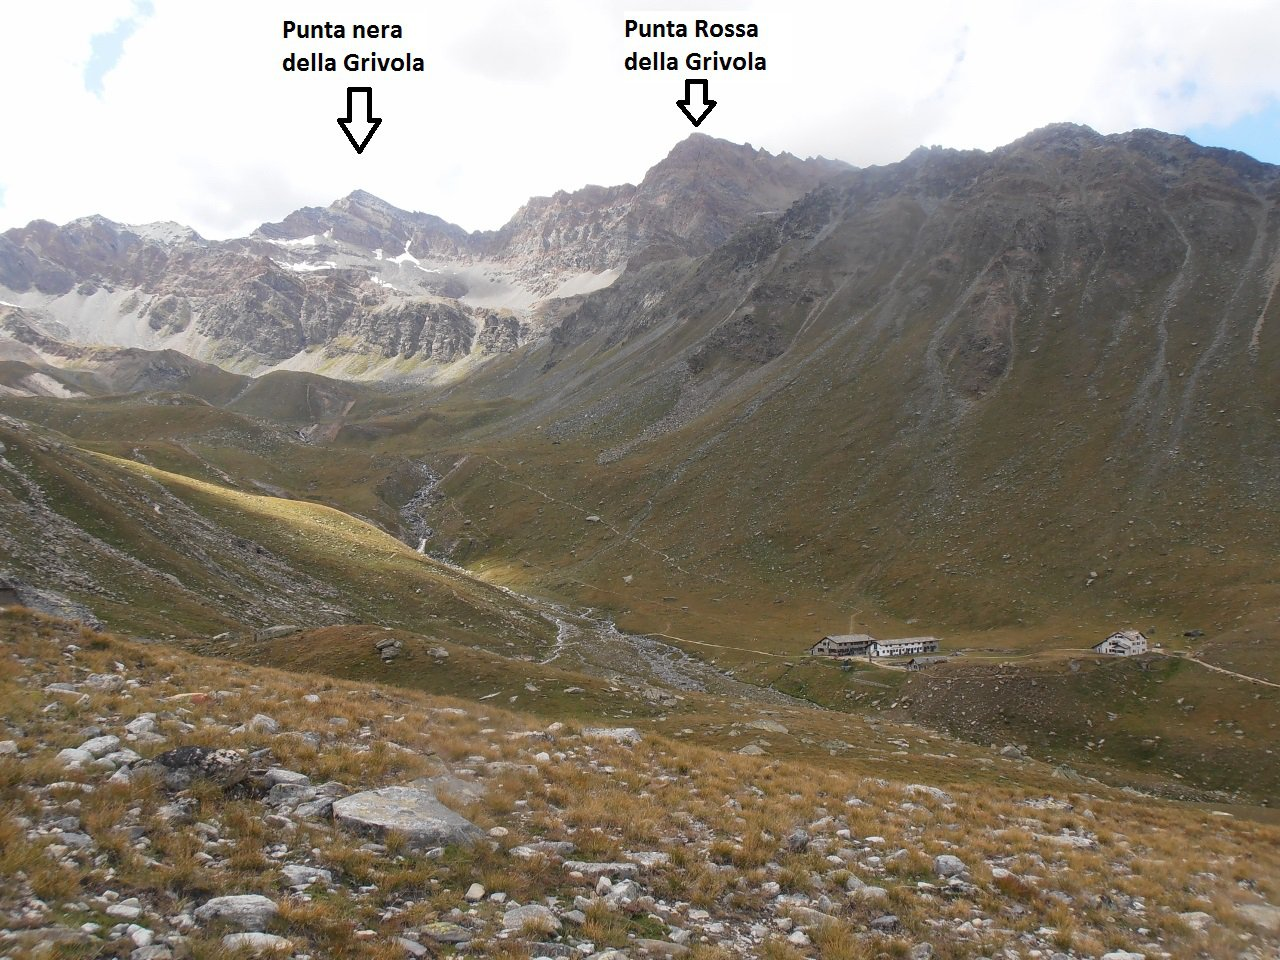 02 - Punta Nera, Punta Rossa e rifugio Vittorio Sella